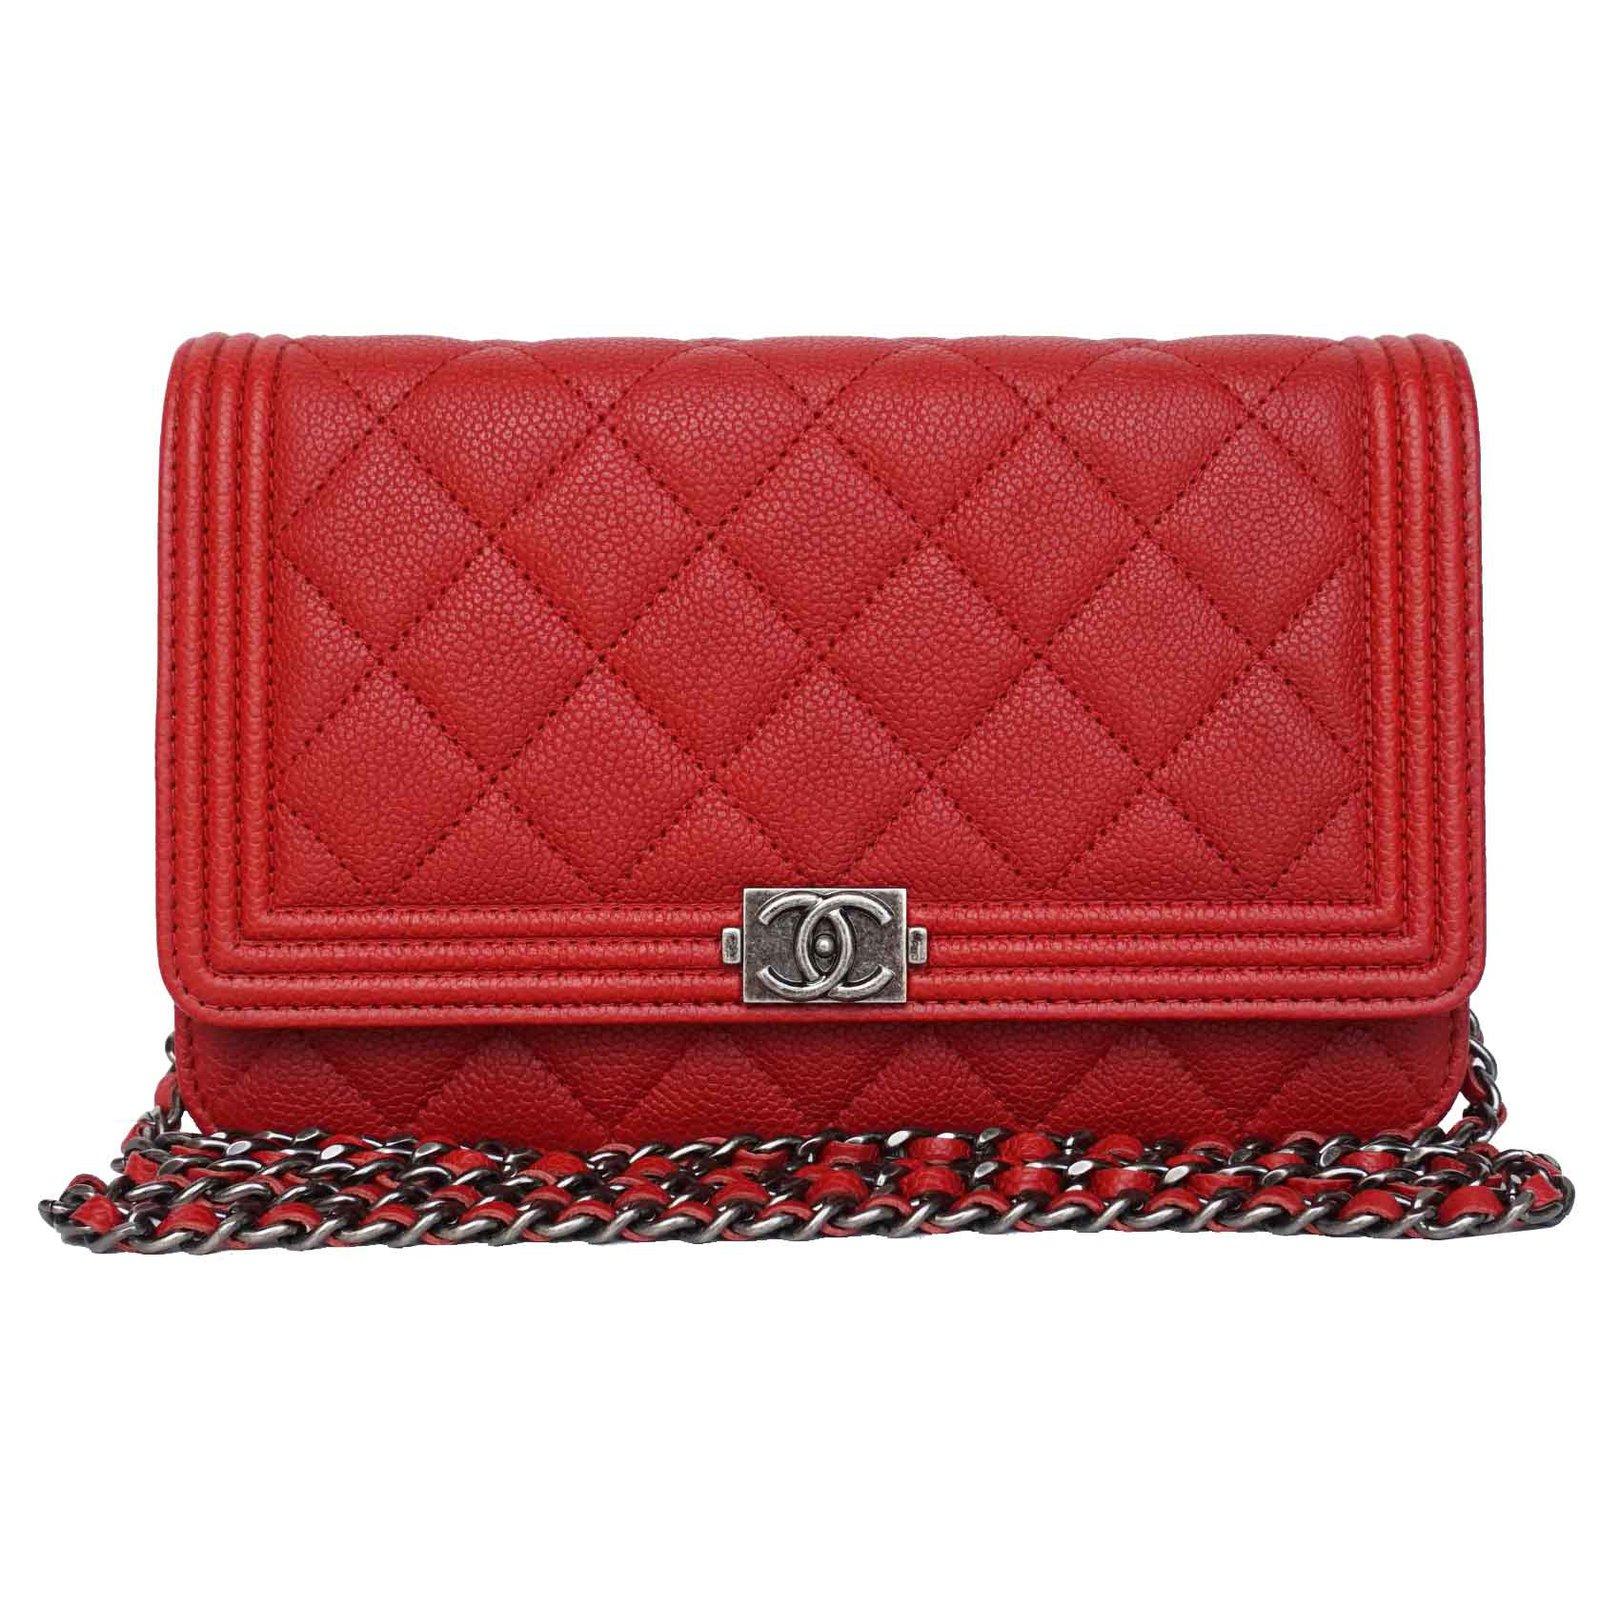 ea9e093b975a Chanel Boy WOC Handbags Leather Red ref.21186 - Joli Closet